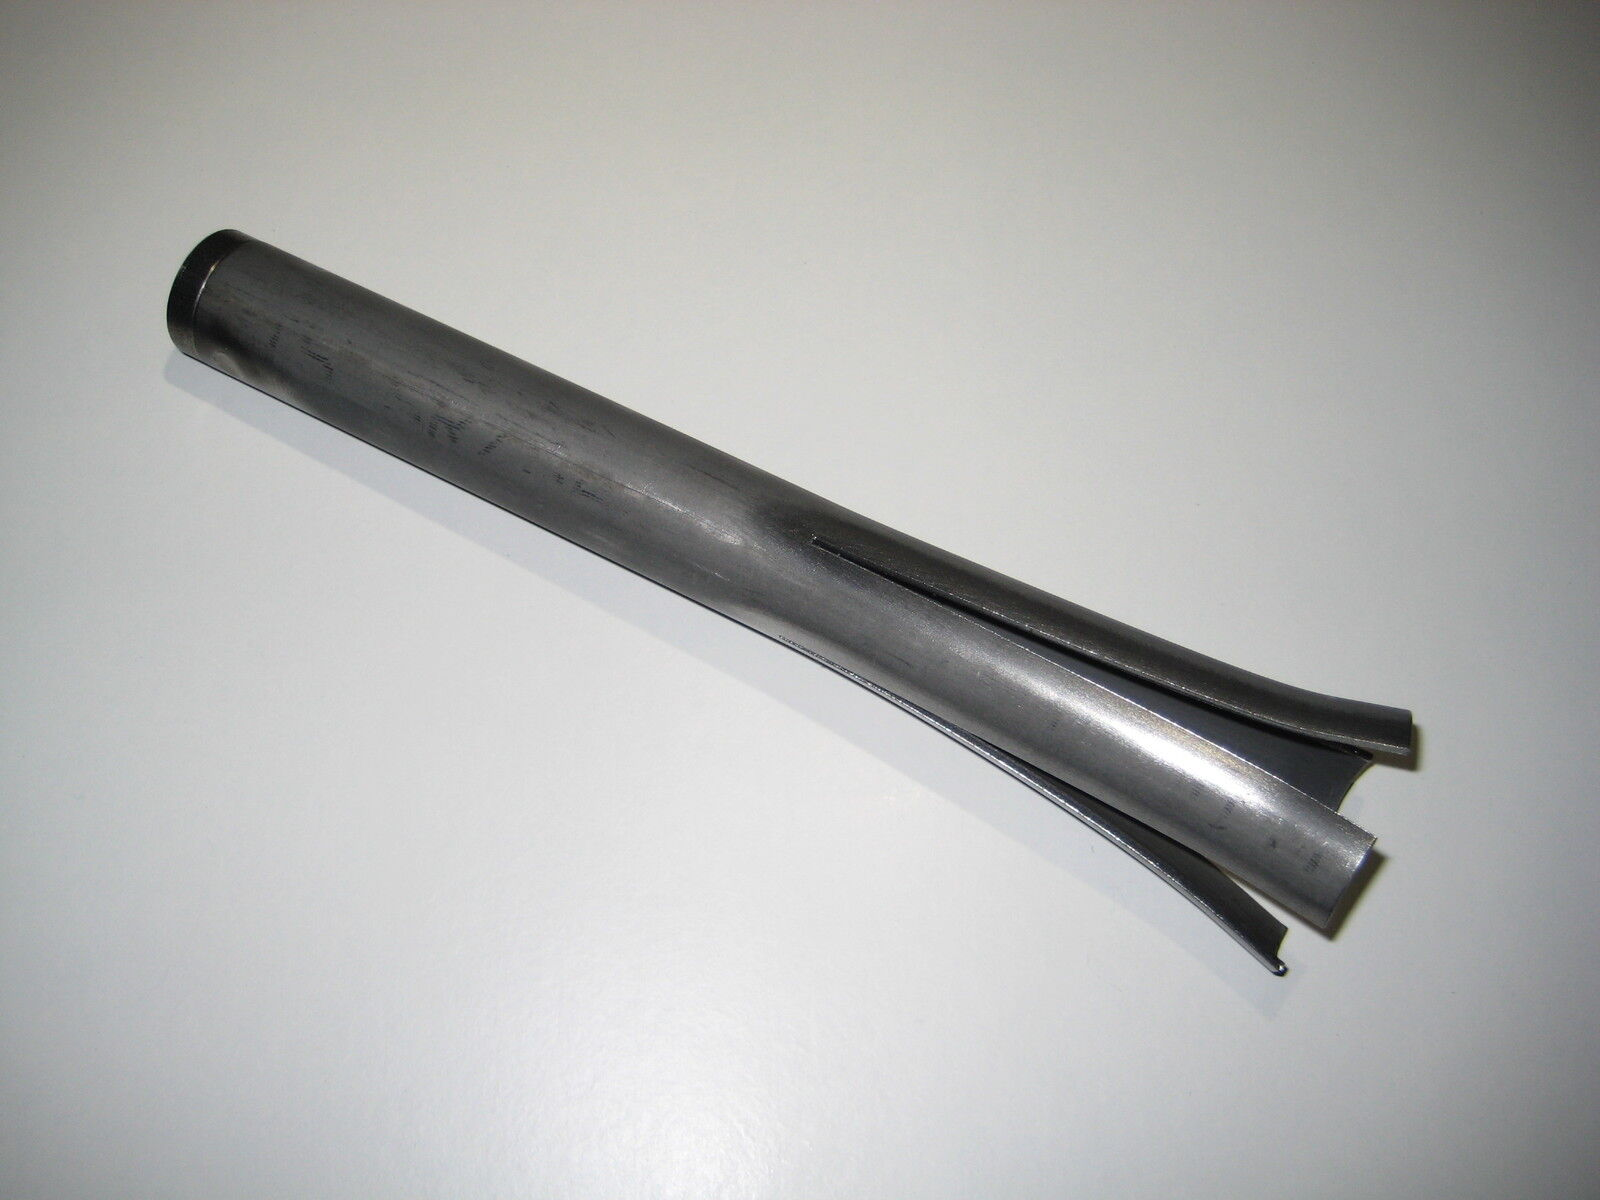 MTB Tools Mountainbike, Fahrrad Konisch Headset Press Werkzeug 2.9cm 3.8cm To 2.9cm Werkzeug 349734